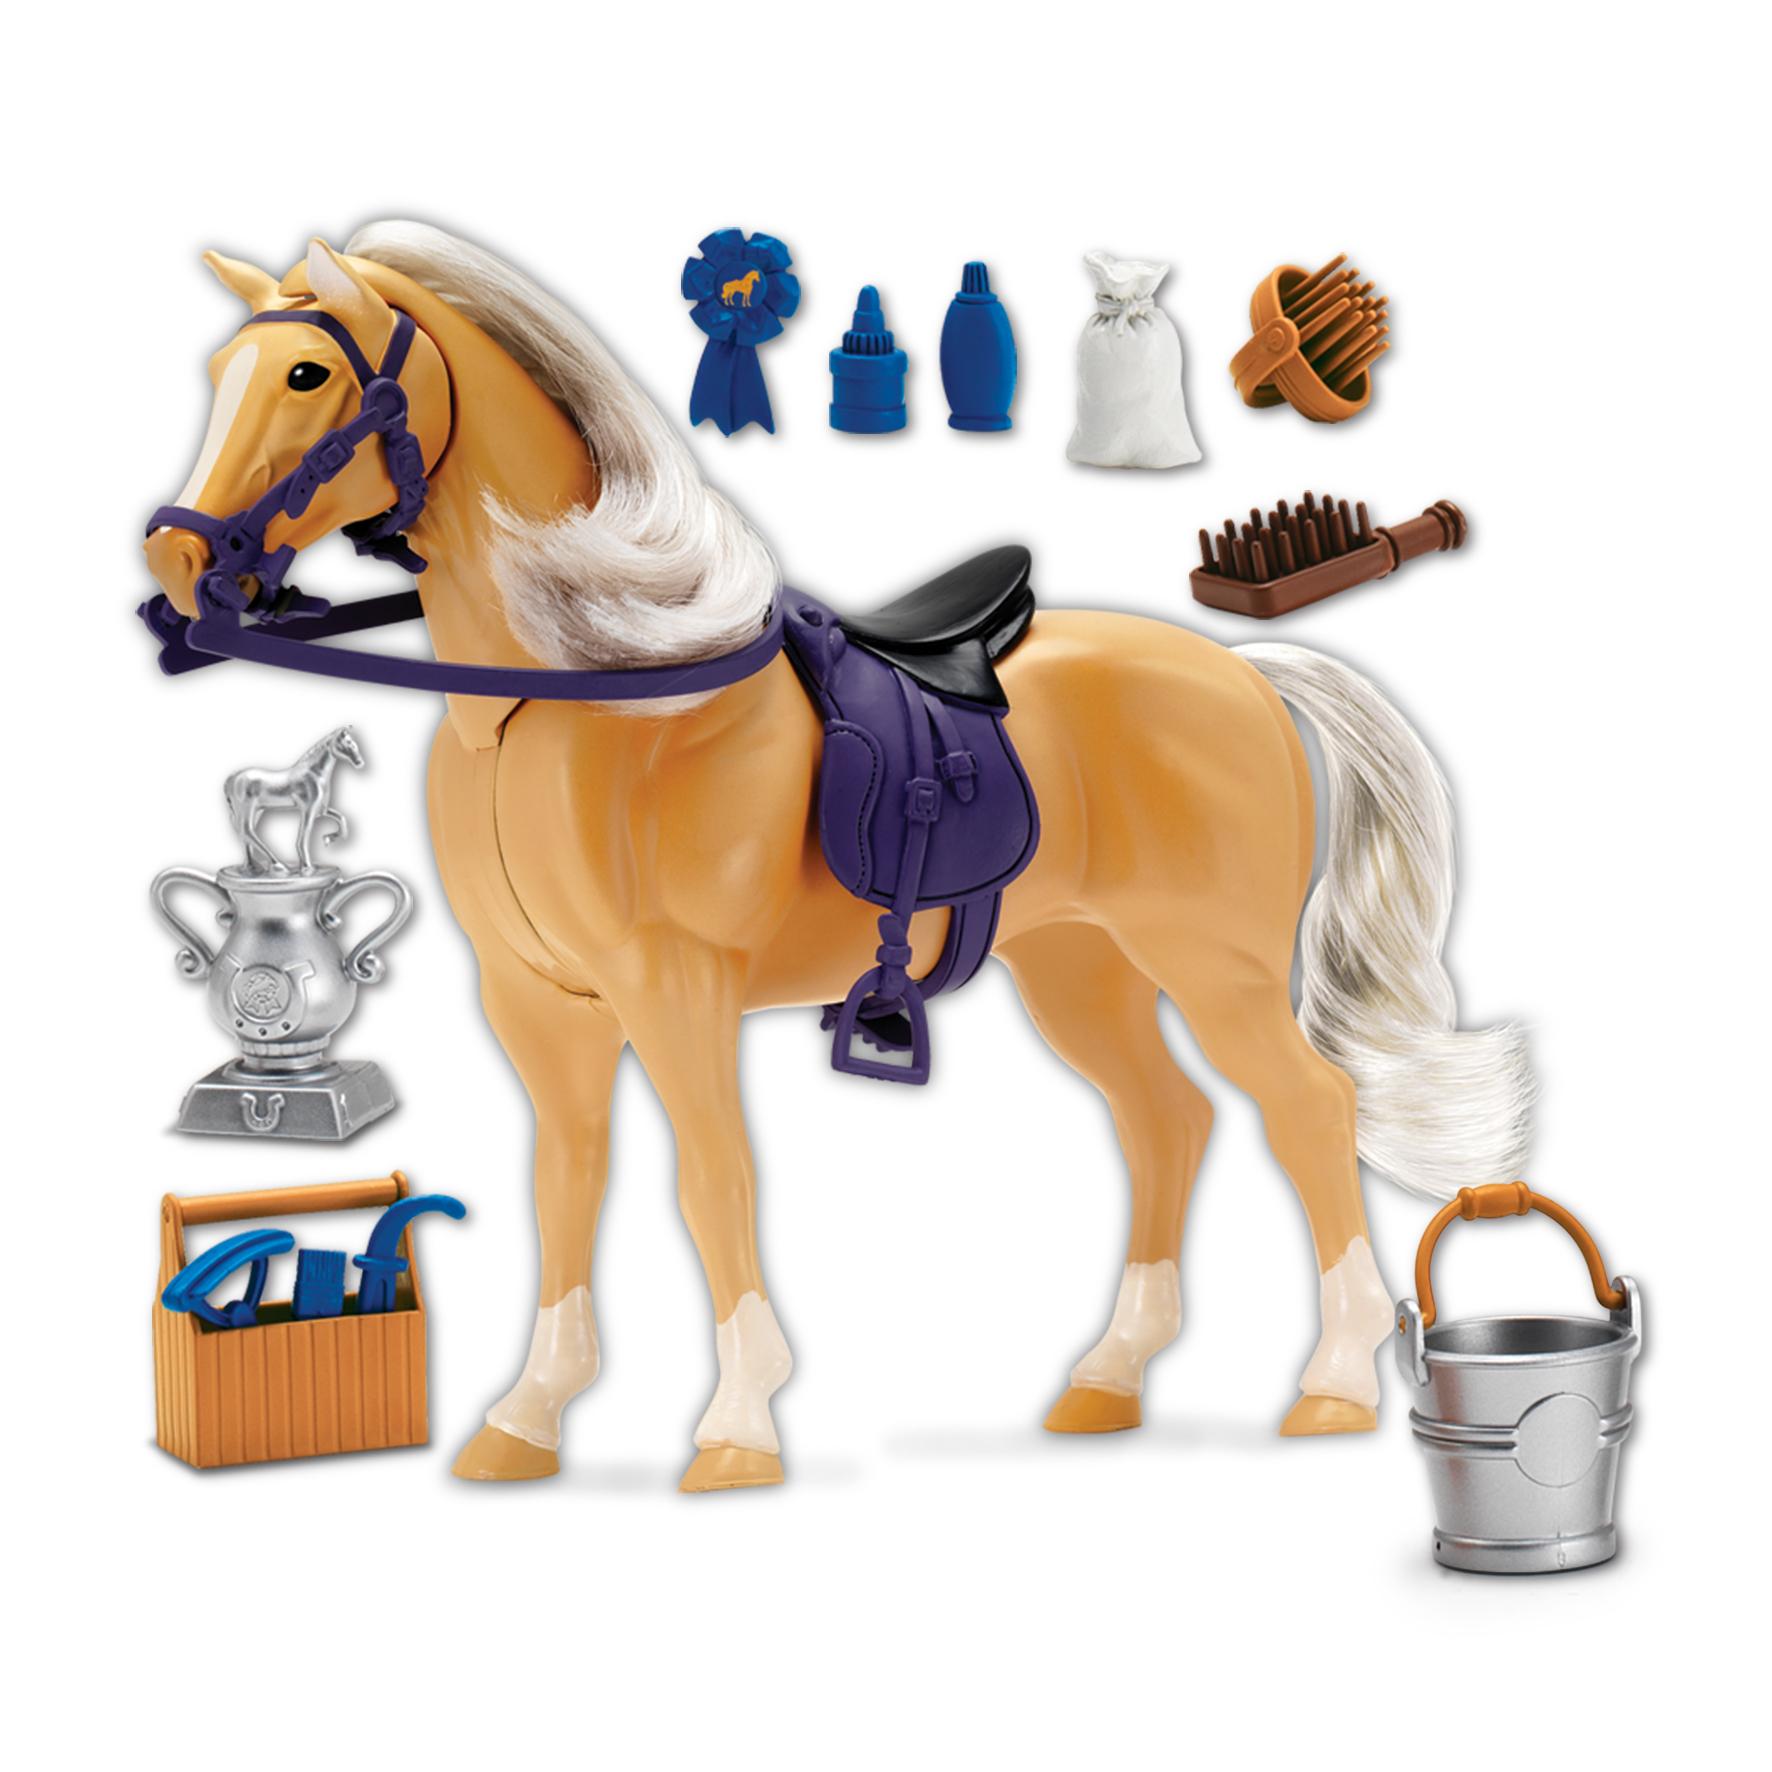 Palomino Deluxe Horse